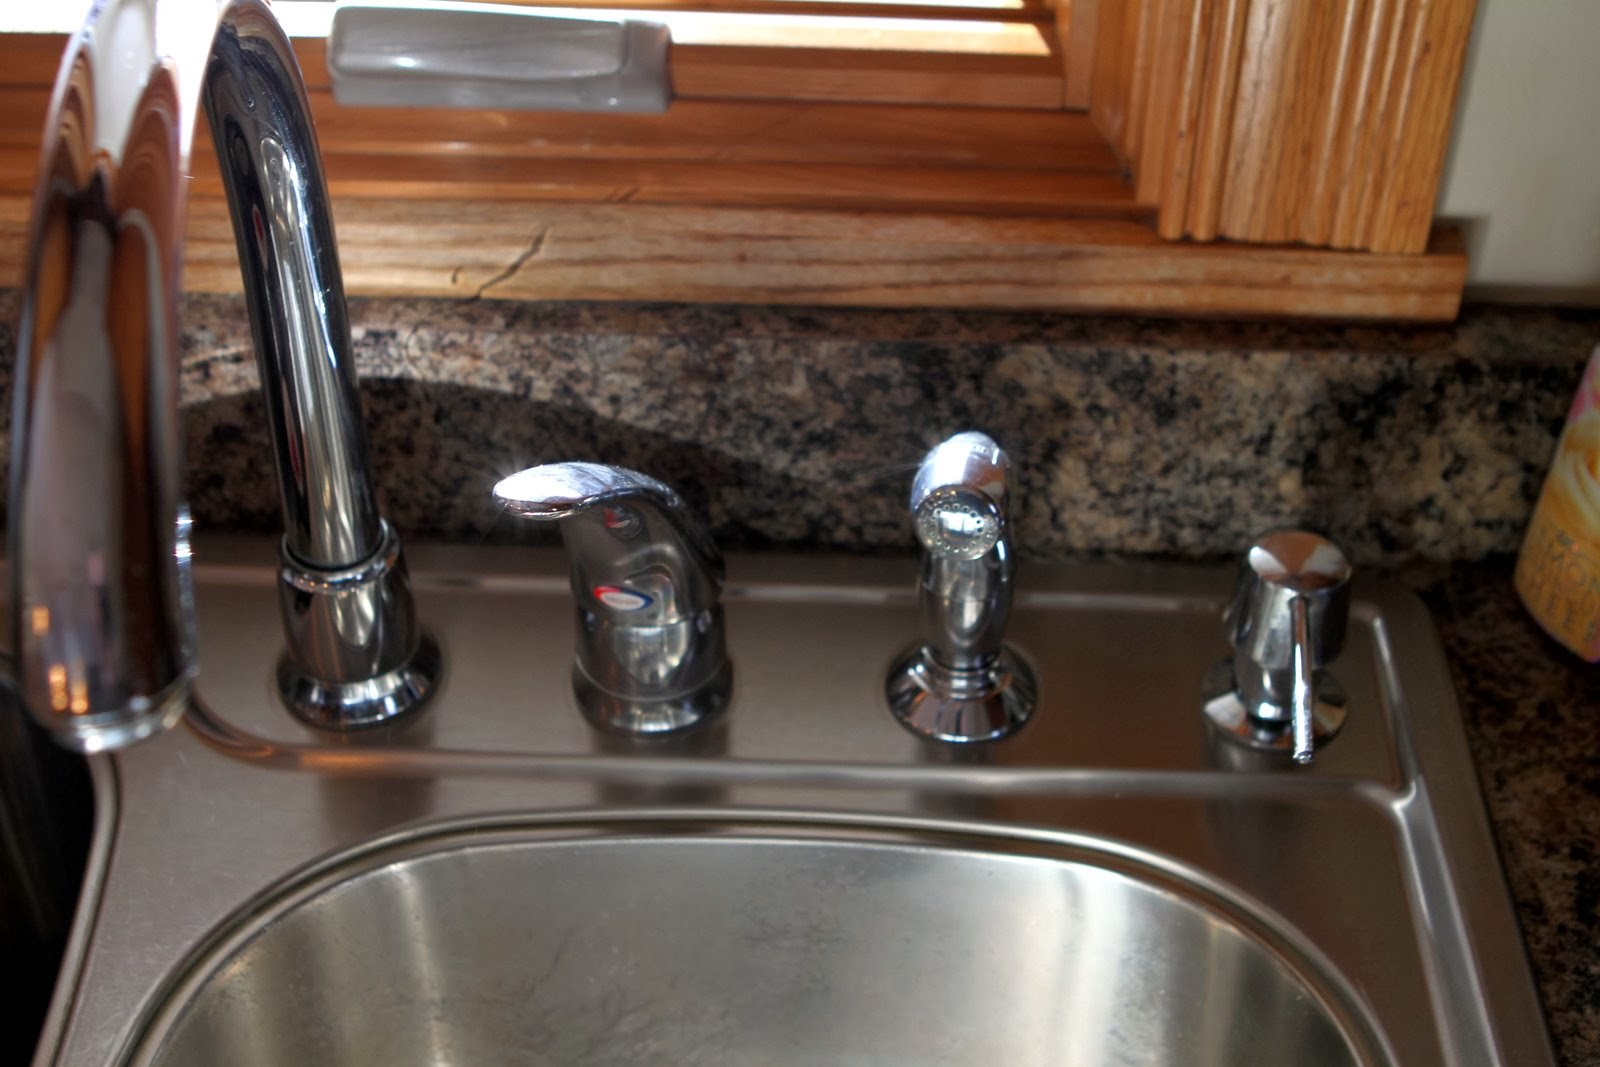 Moen Kitchen Corner Shelves 1225 Faucet Cartridge Repair Or Replacement